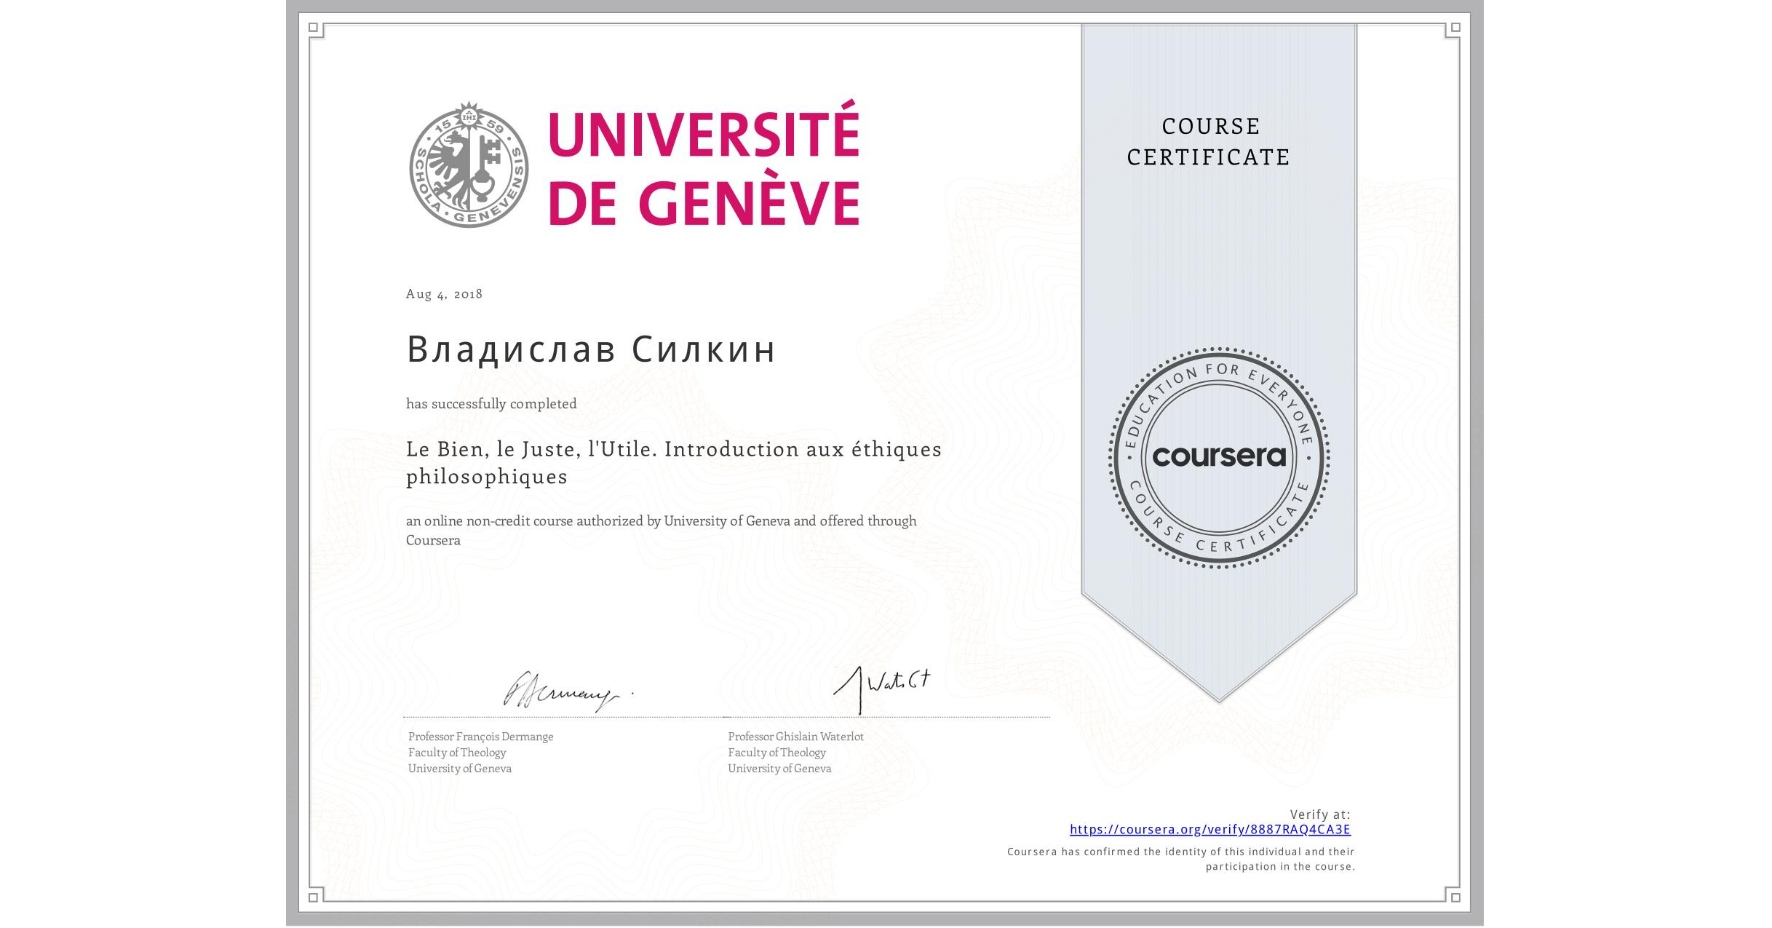 View certificate for Владислав Силкин, Le Bien, le Juste, l'Utile. Introduction aux éthiques philosophiques, an online non-credit course authorized by University of Geneva and offered through Coursera